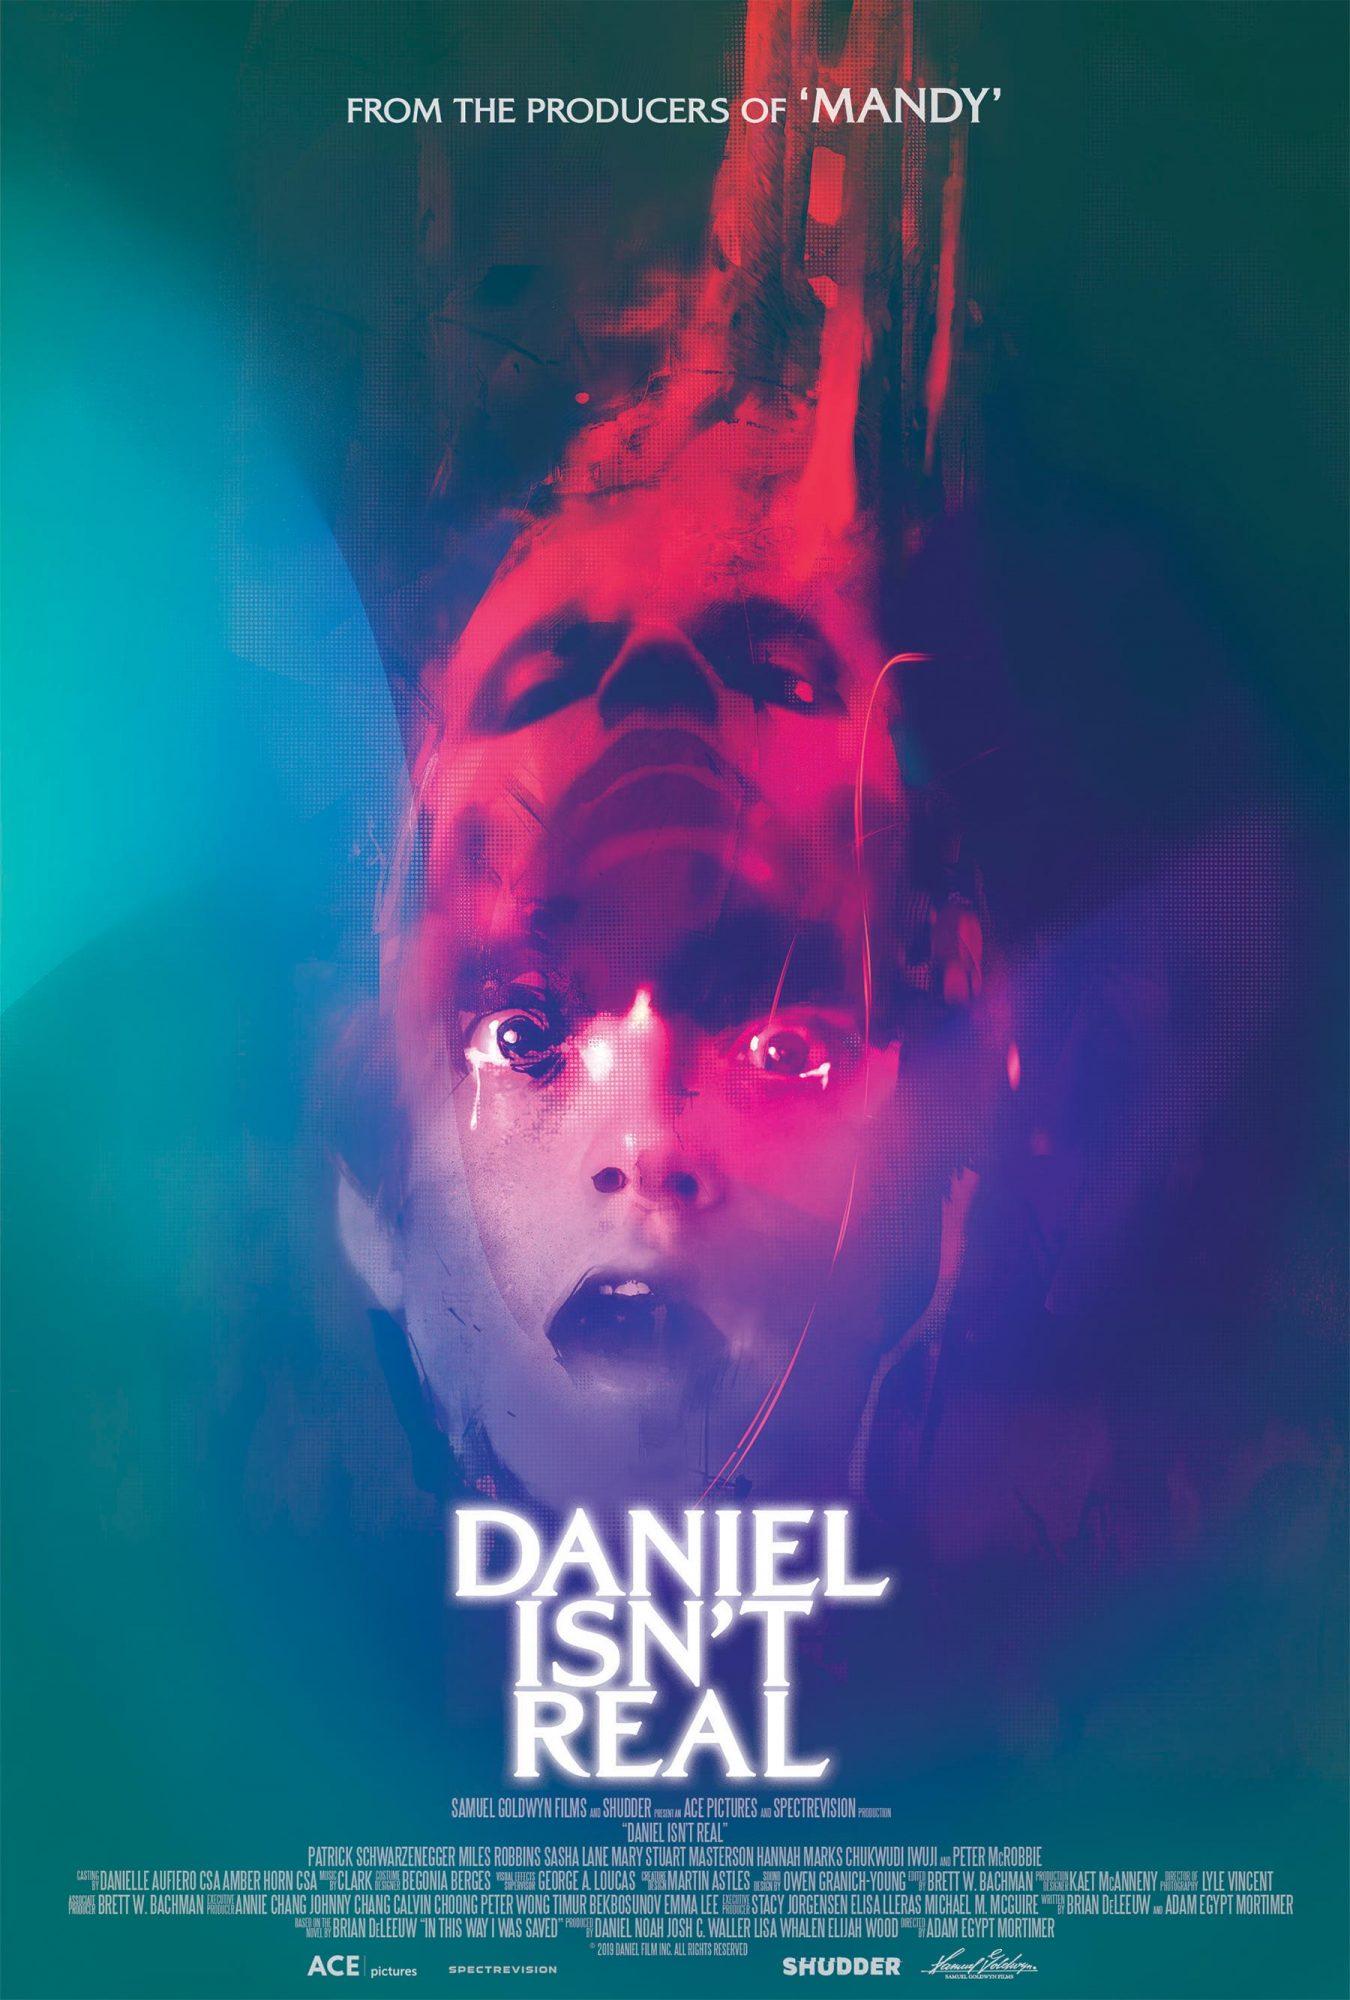 DANIEL ISN'T REAL movie poster CR: Shudder